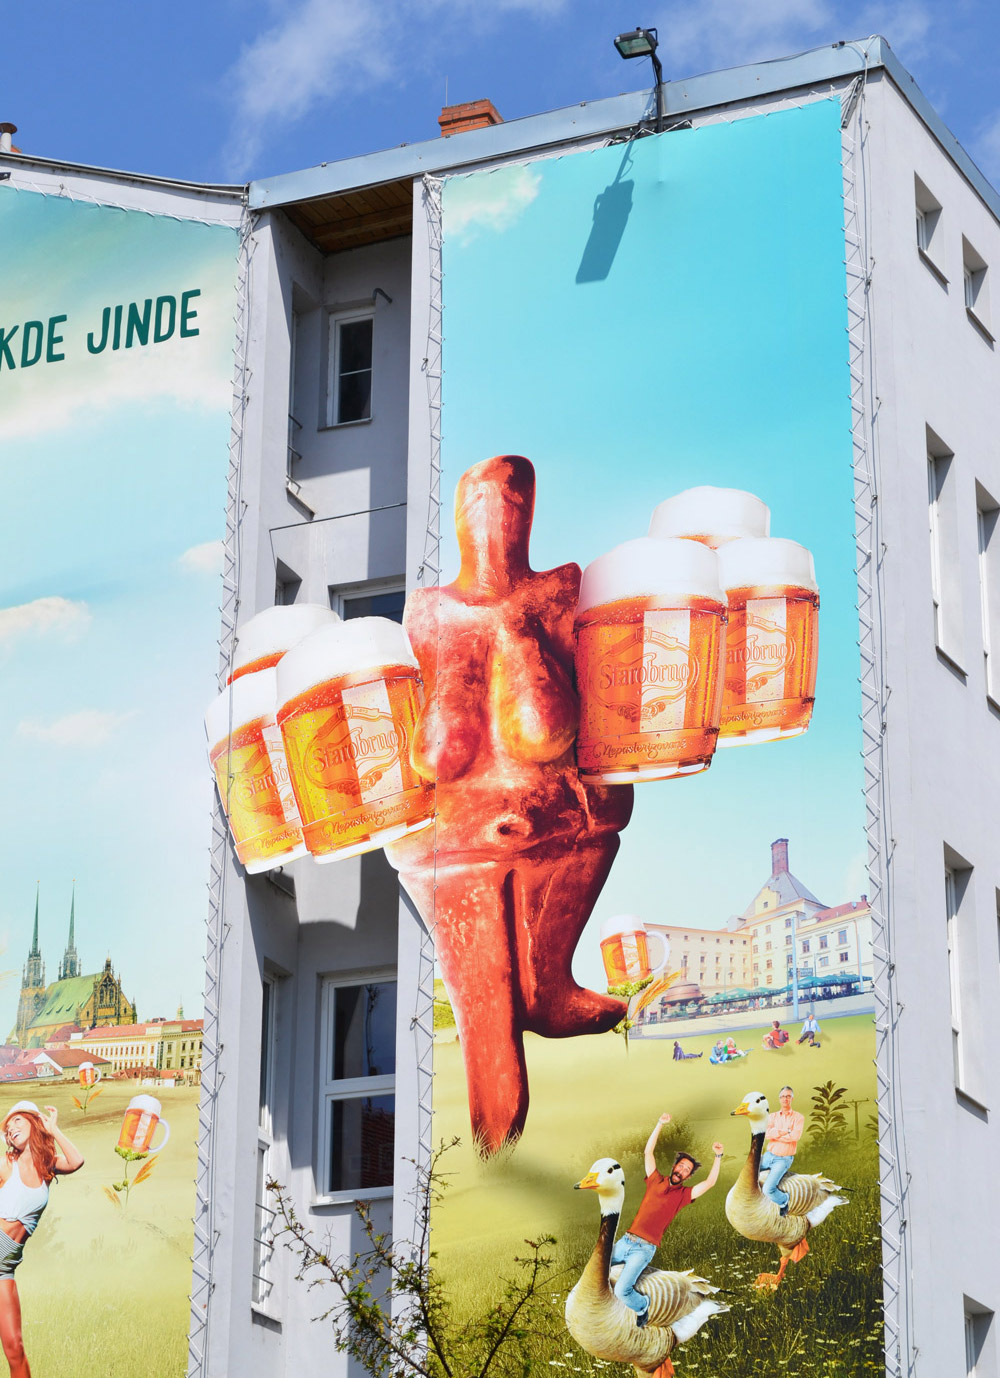 Venkovní-reklamní-plocha-Brno-Mendlovo-náměstí-026ZB-Starobrno-Venuše-2